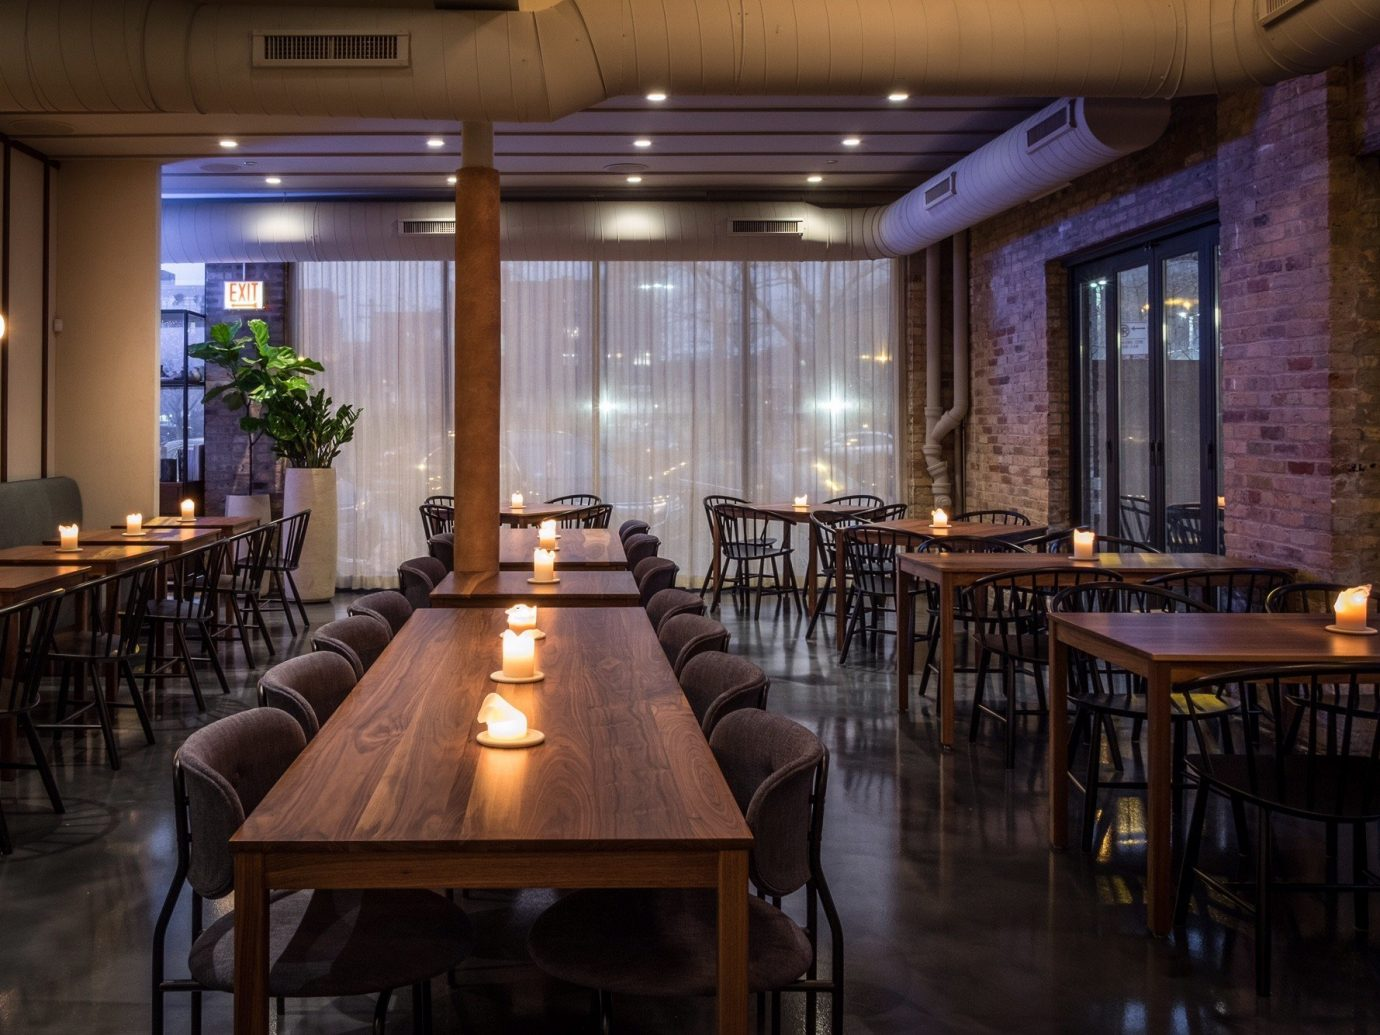 Food + Drink table floor indoor ceiling room chair Dining wooden restaurant function hall Bar estate interior design meal furniture ballroom wood area several dining room